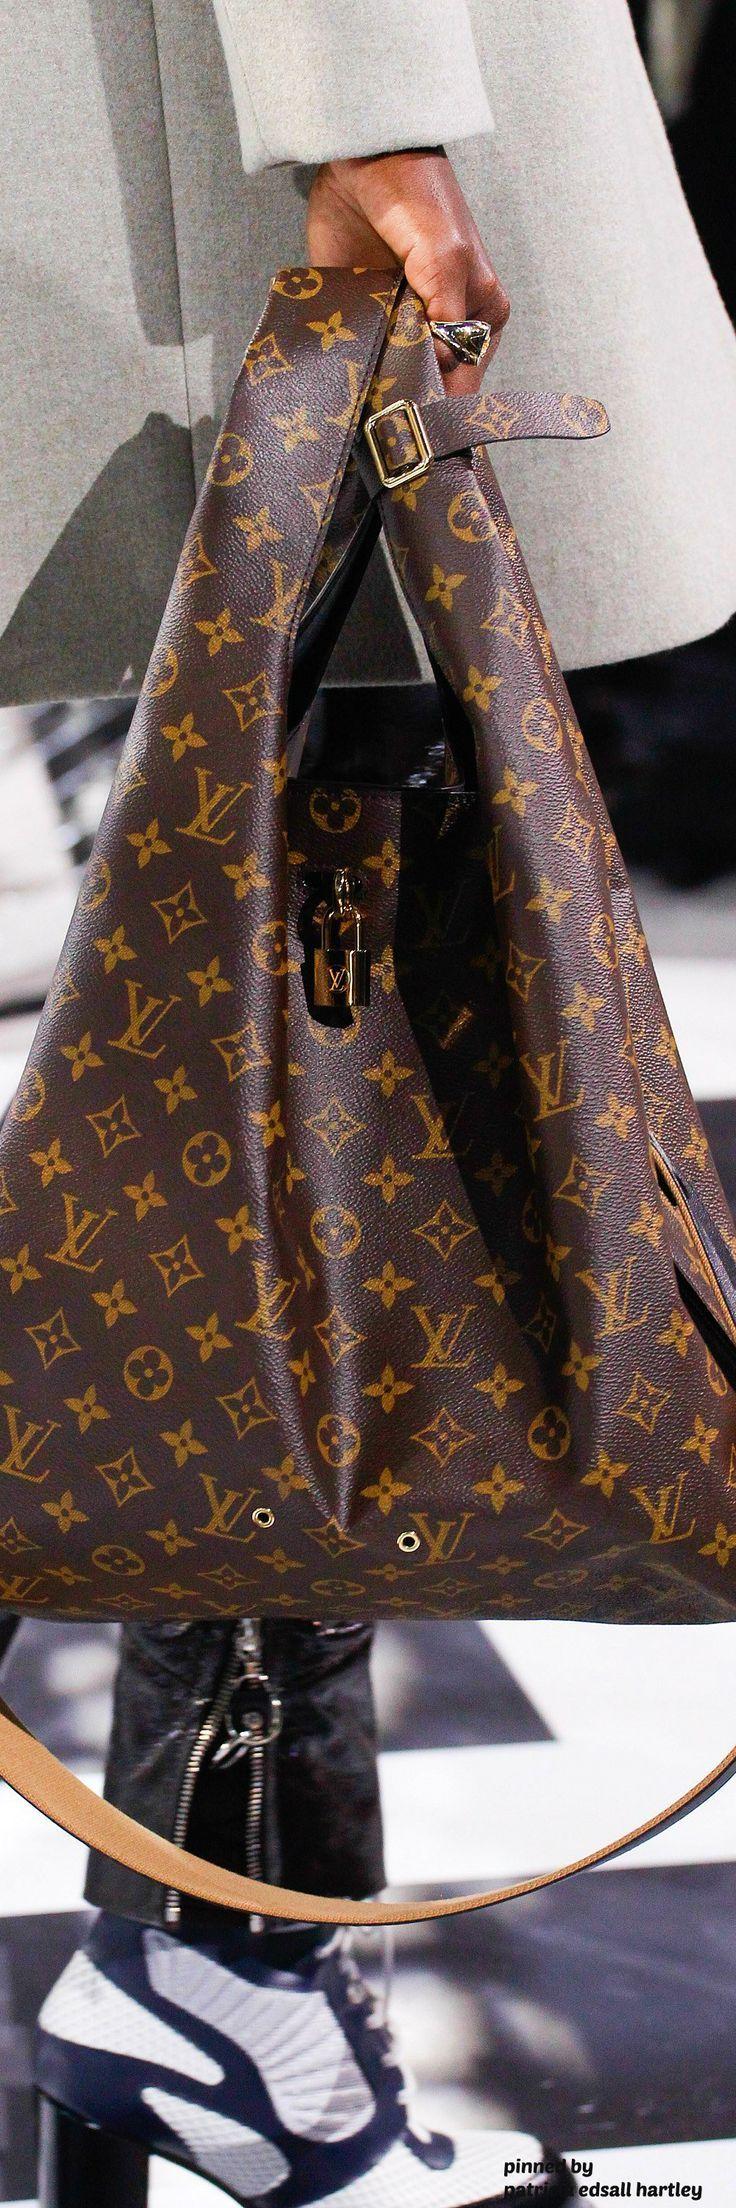 Louis Vuitton 2016 Clothing, Shoes & Jewelry : Women : Handbags & Wallets : http://amzn.to/2jBKNH8